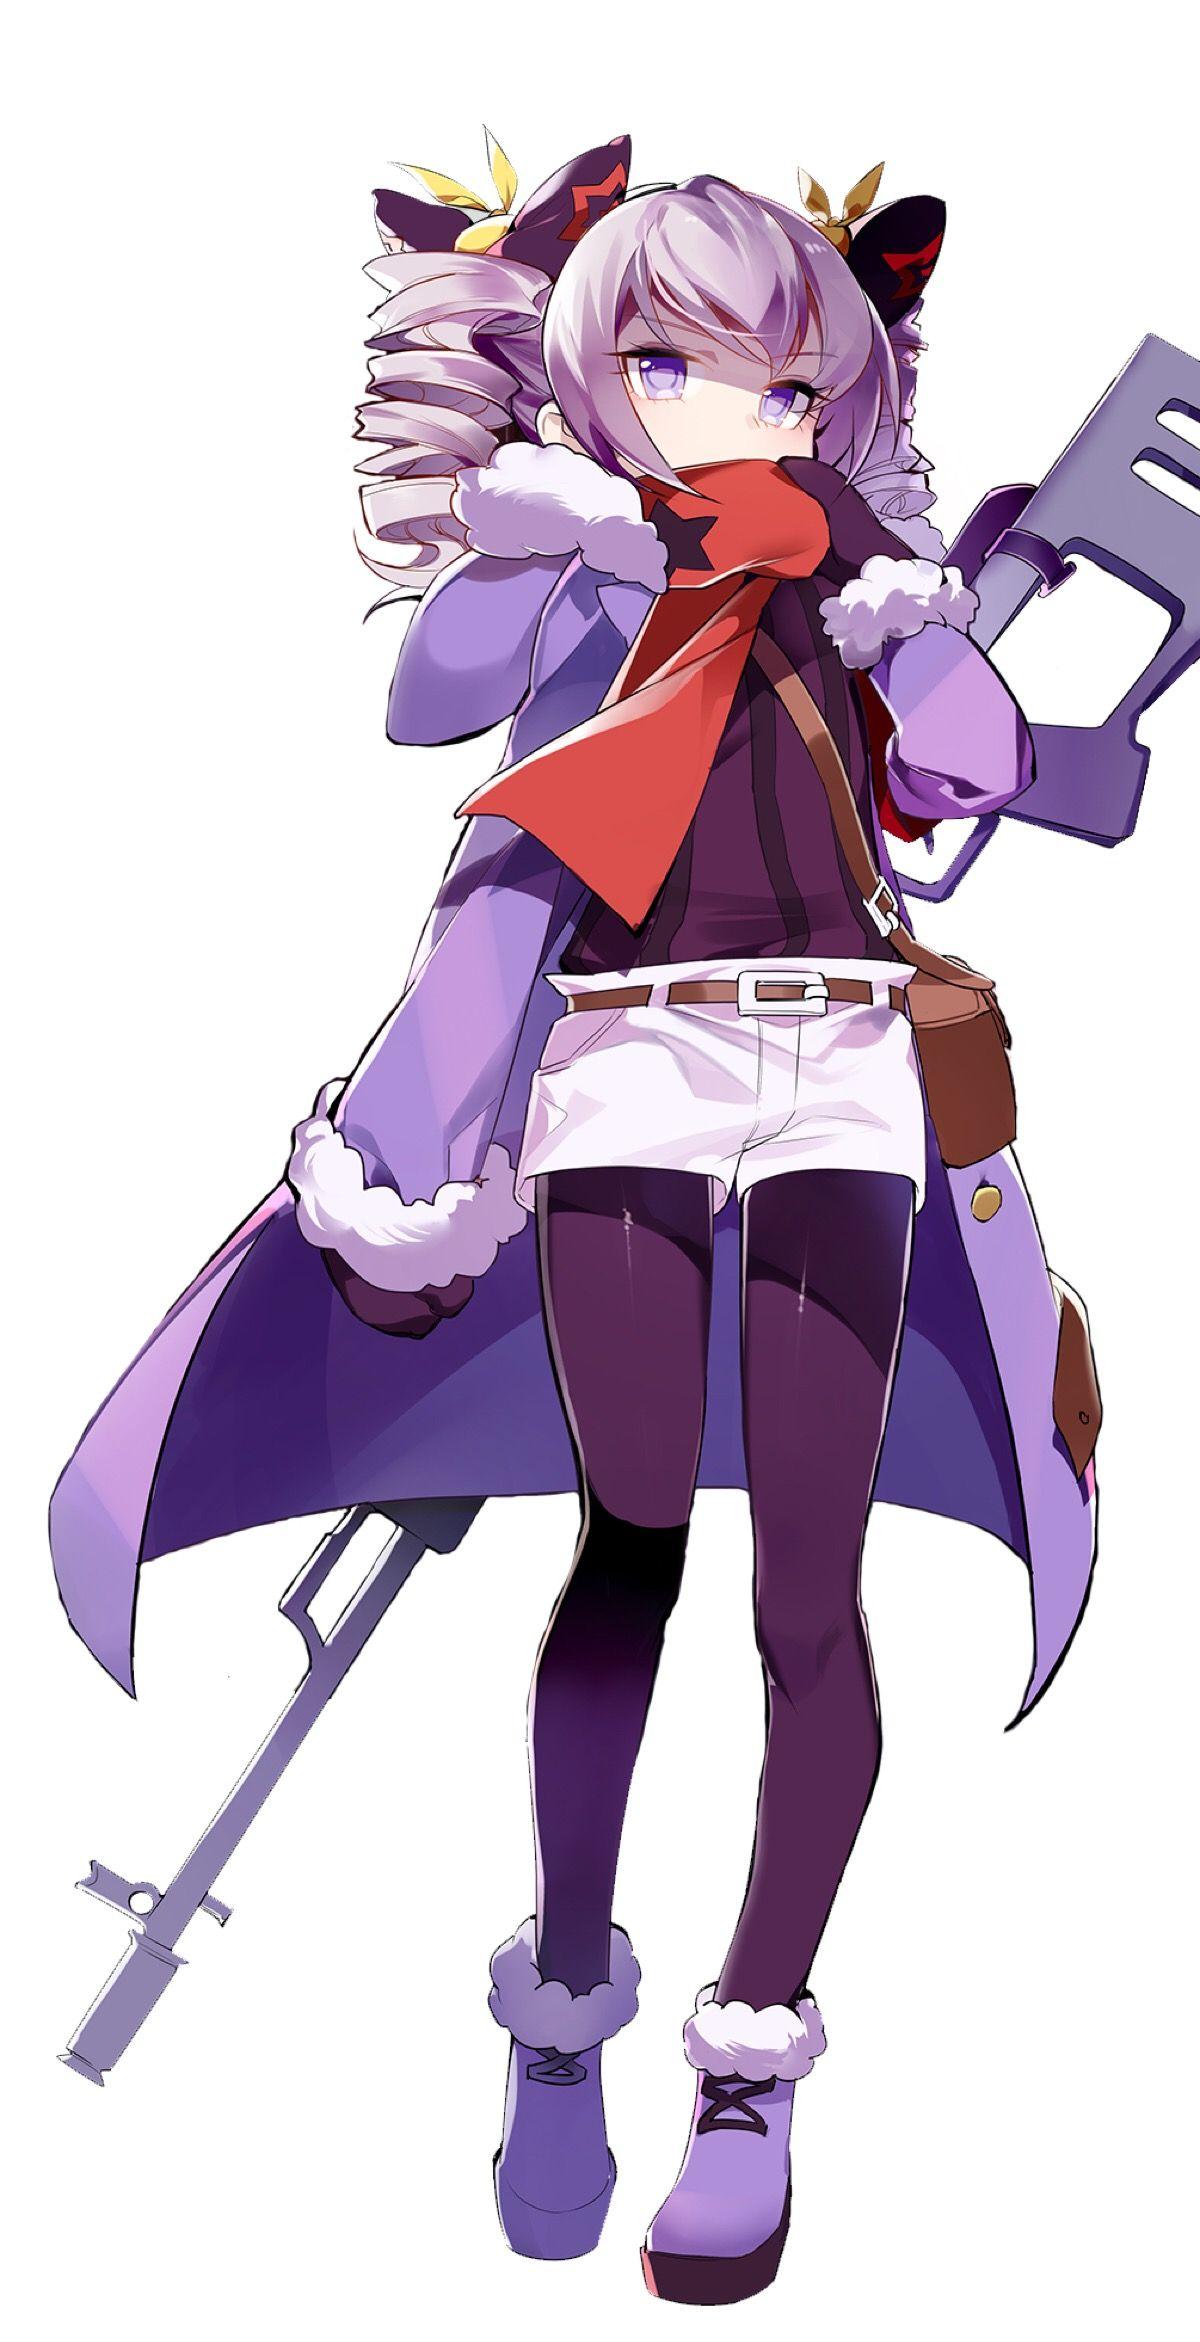 Ghim Của Anthonie Jones Posing Tren Guns Girl Honkai Gakuen Anime Nghệ Thuật Anime Nghệ Thuật